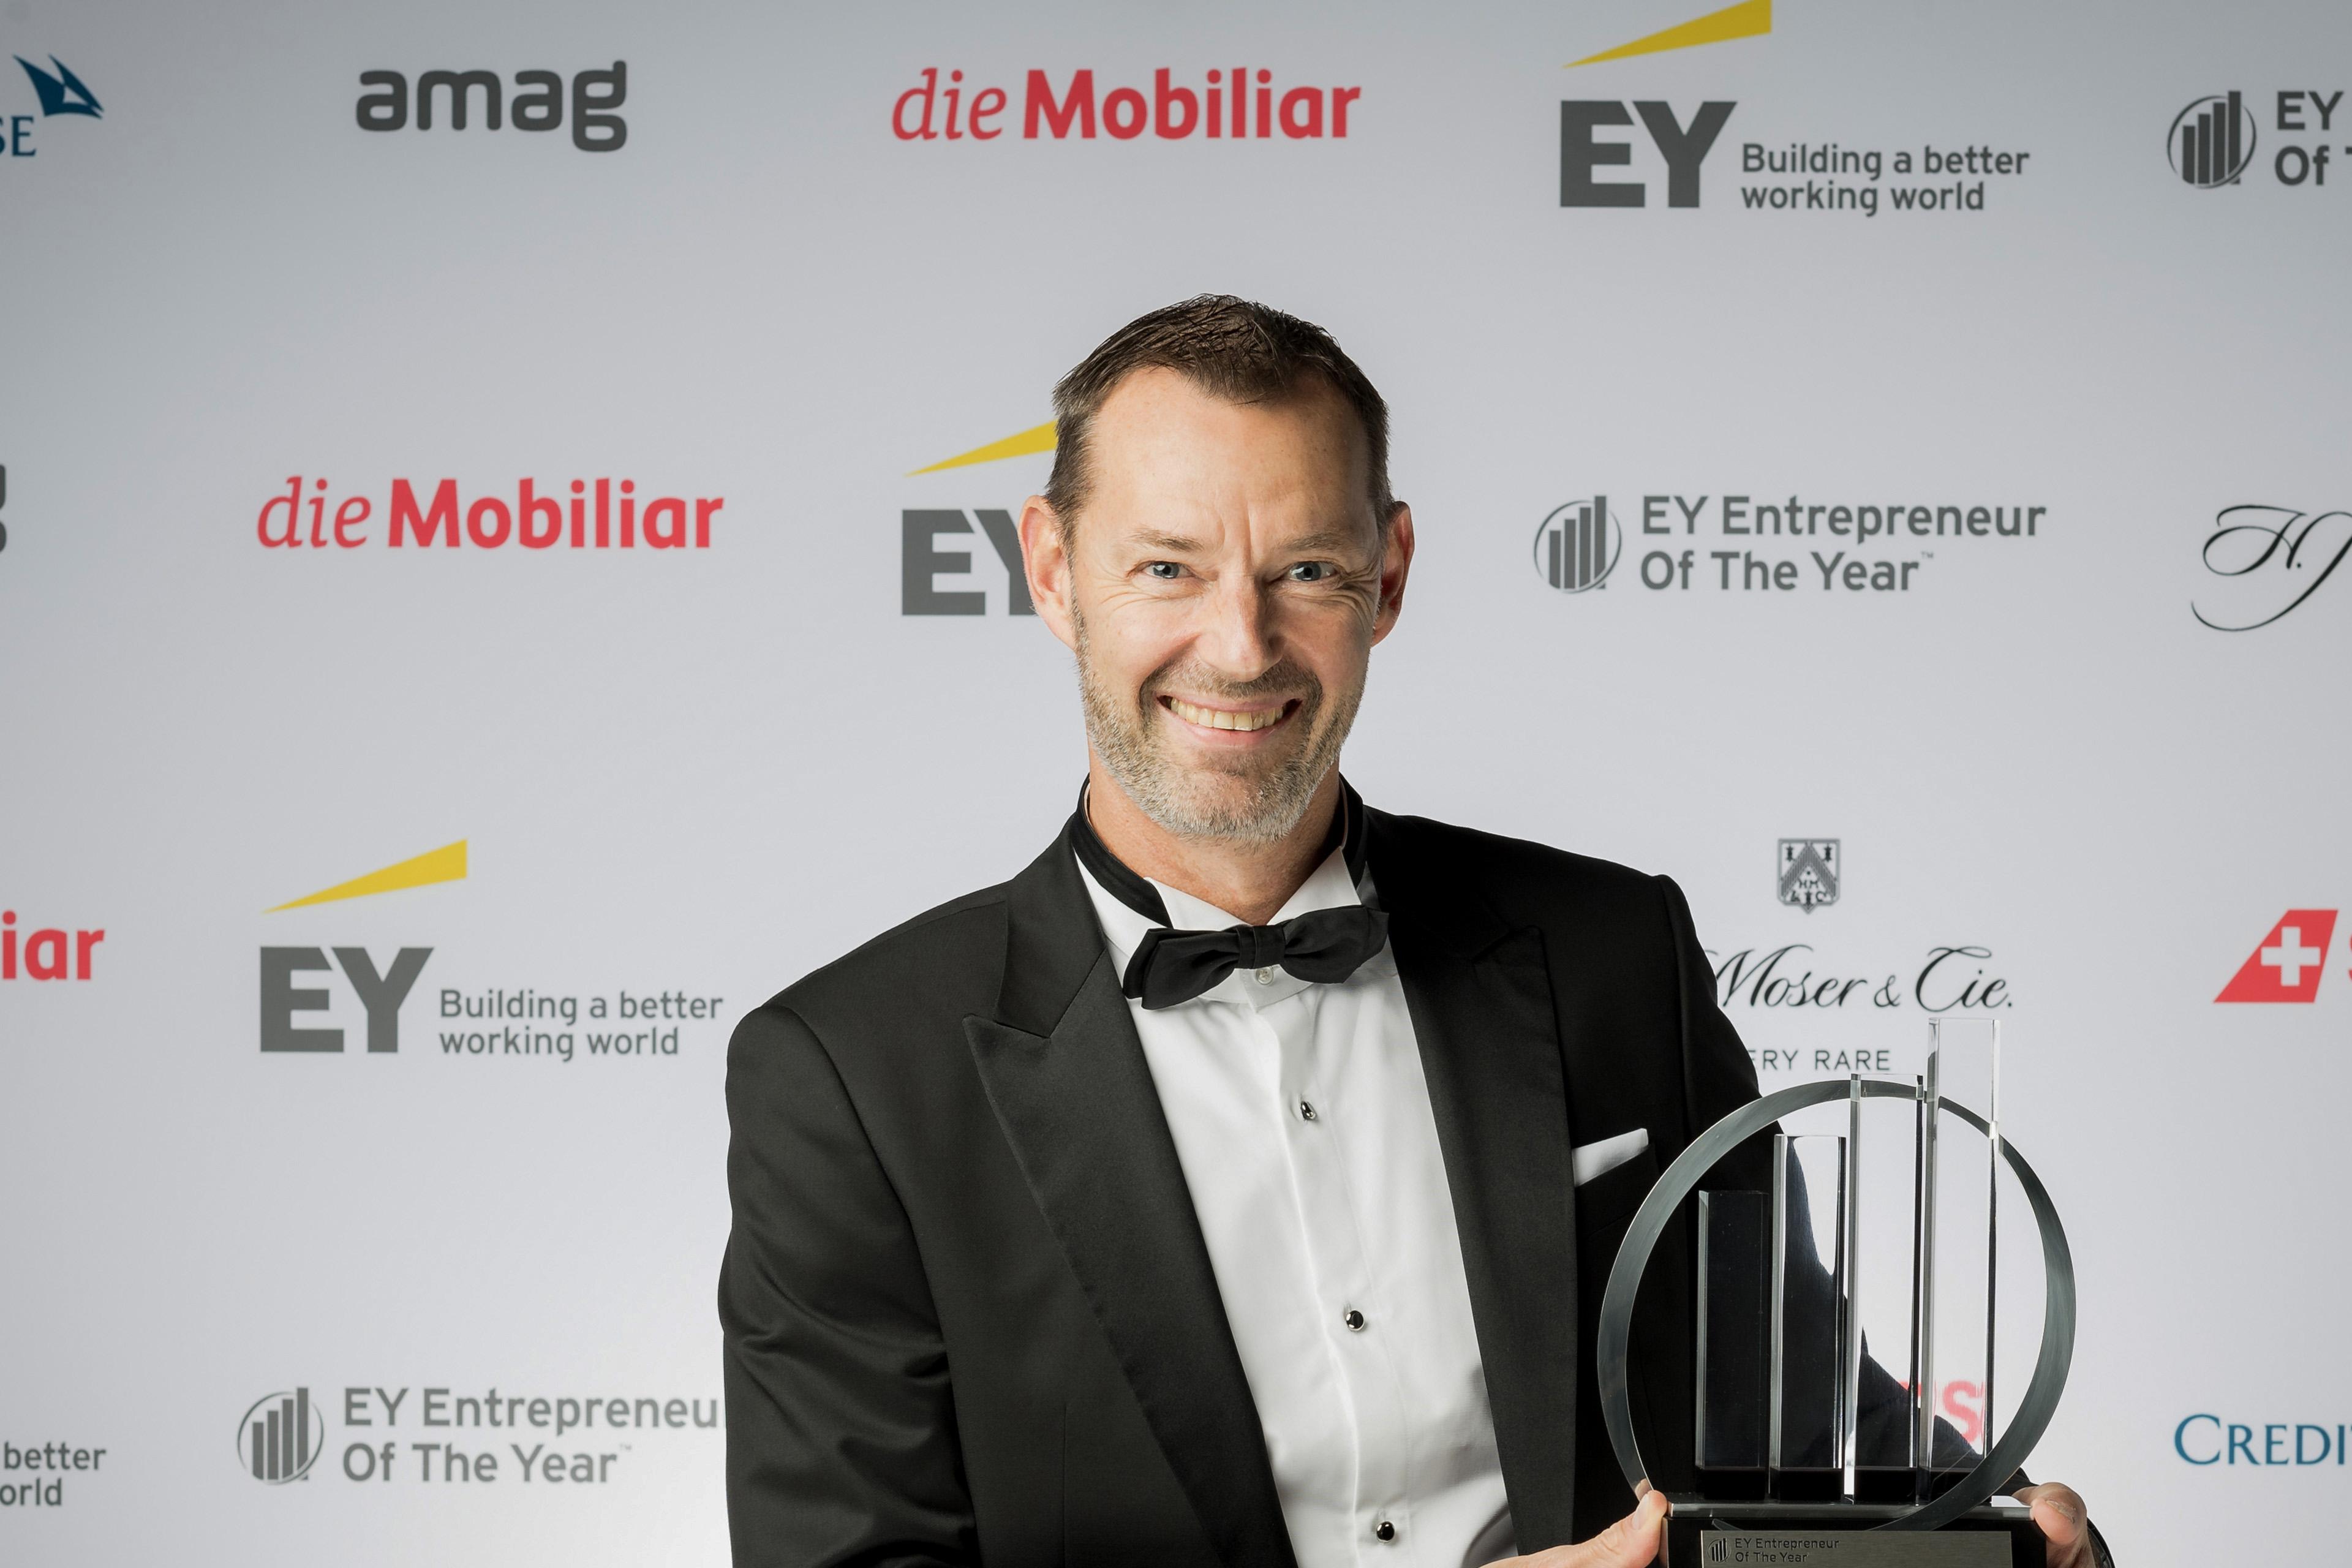 2019 Entrepreneur Dr. Christian Brönnimann